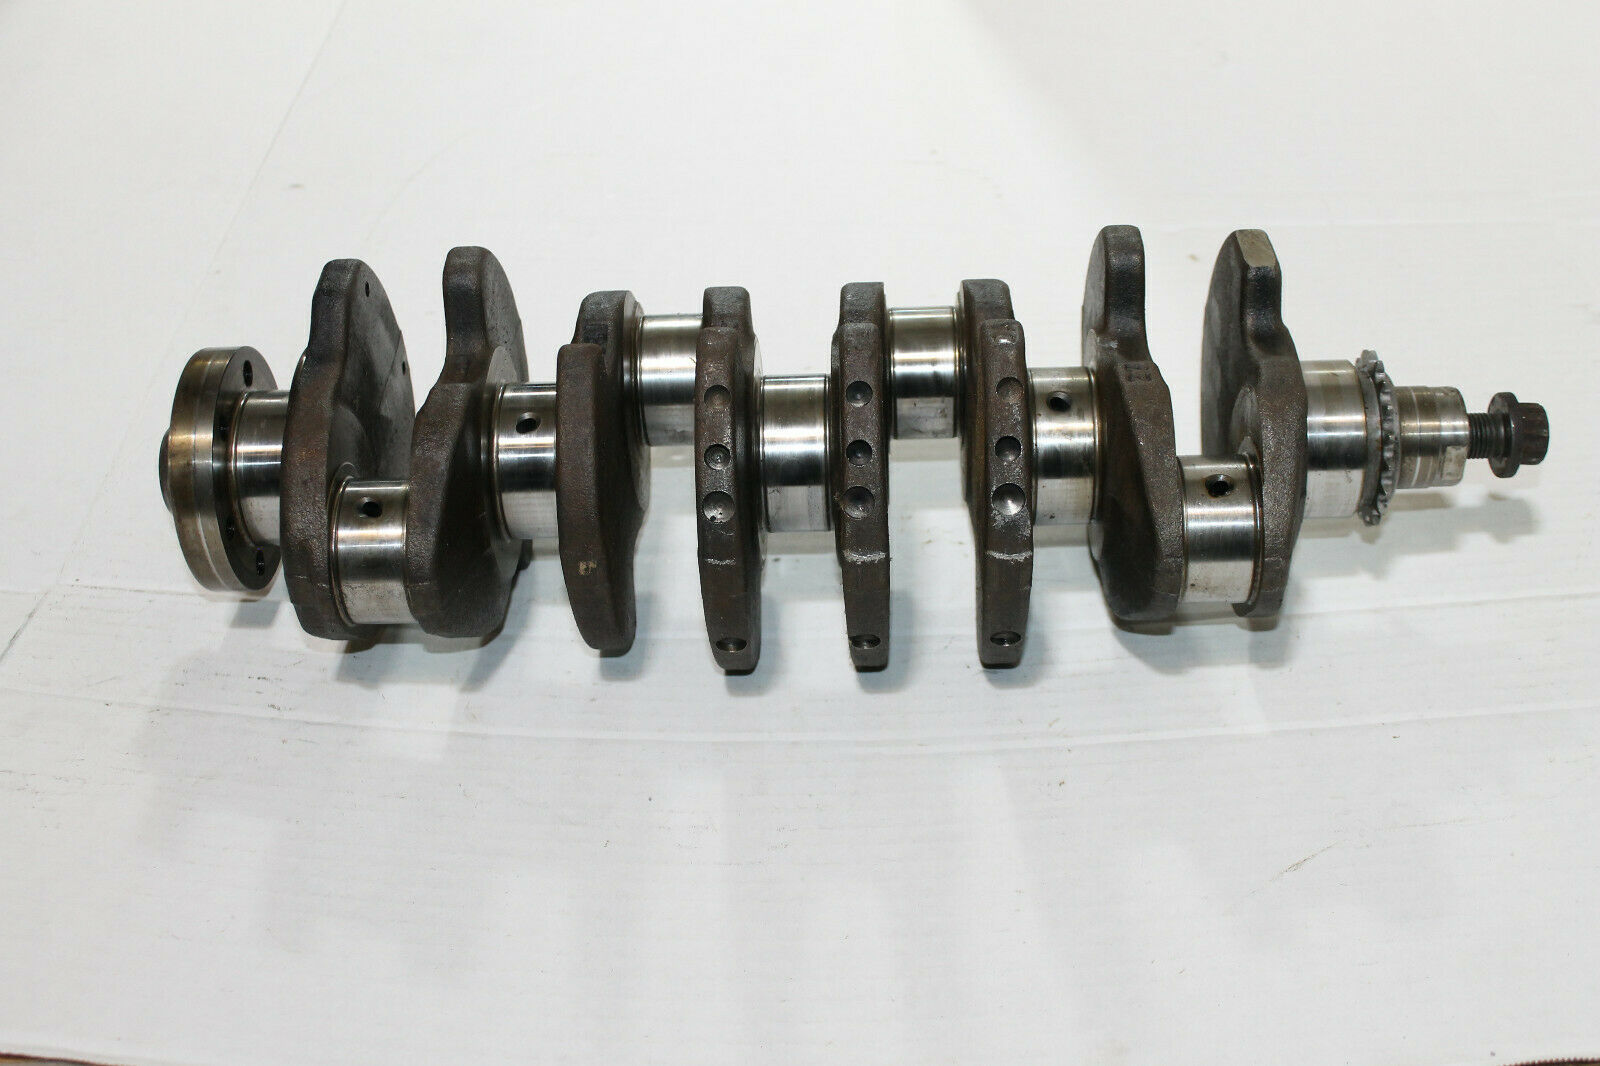 99-04 MK4 Volkswagen VW TDI ALH 1.9L Engine Crankshaft Jetta Golf image 2